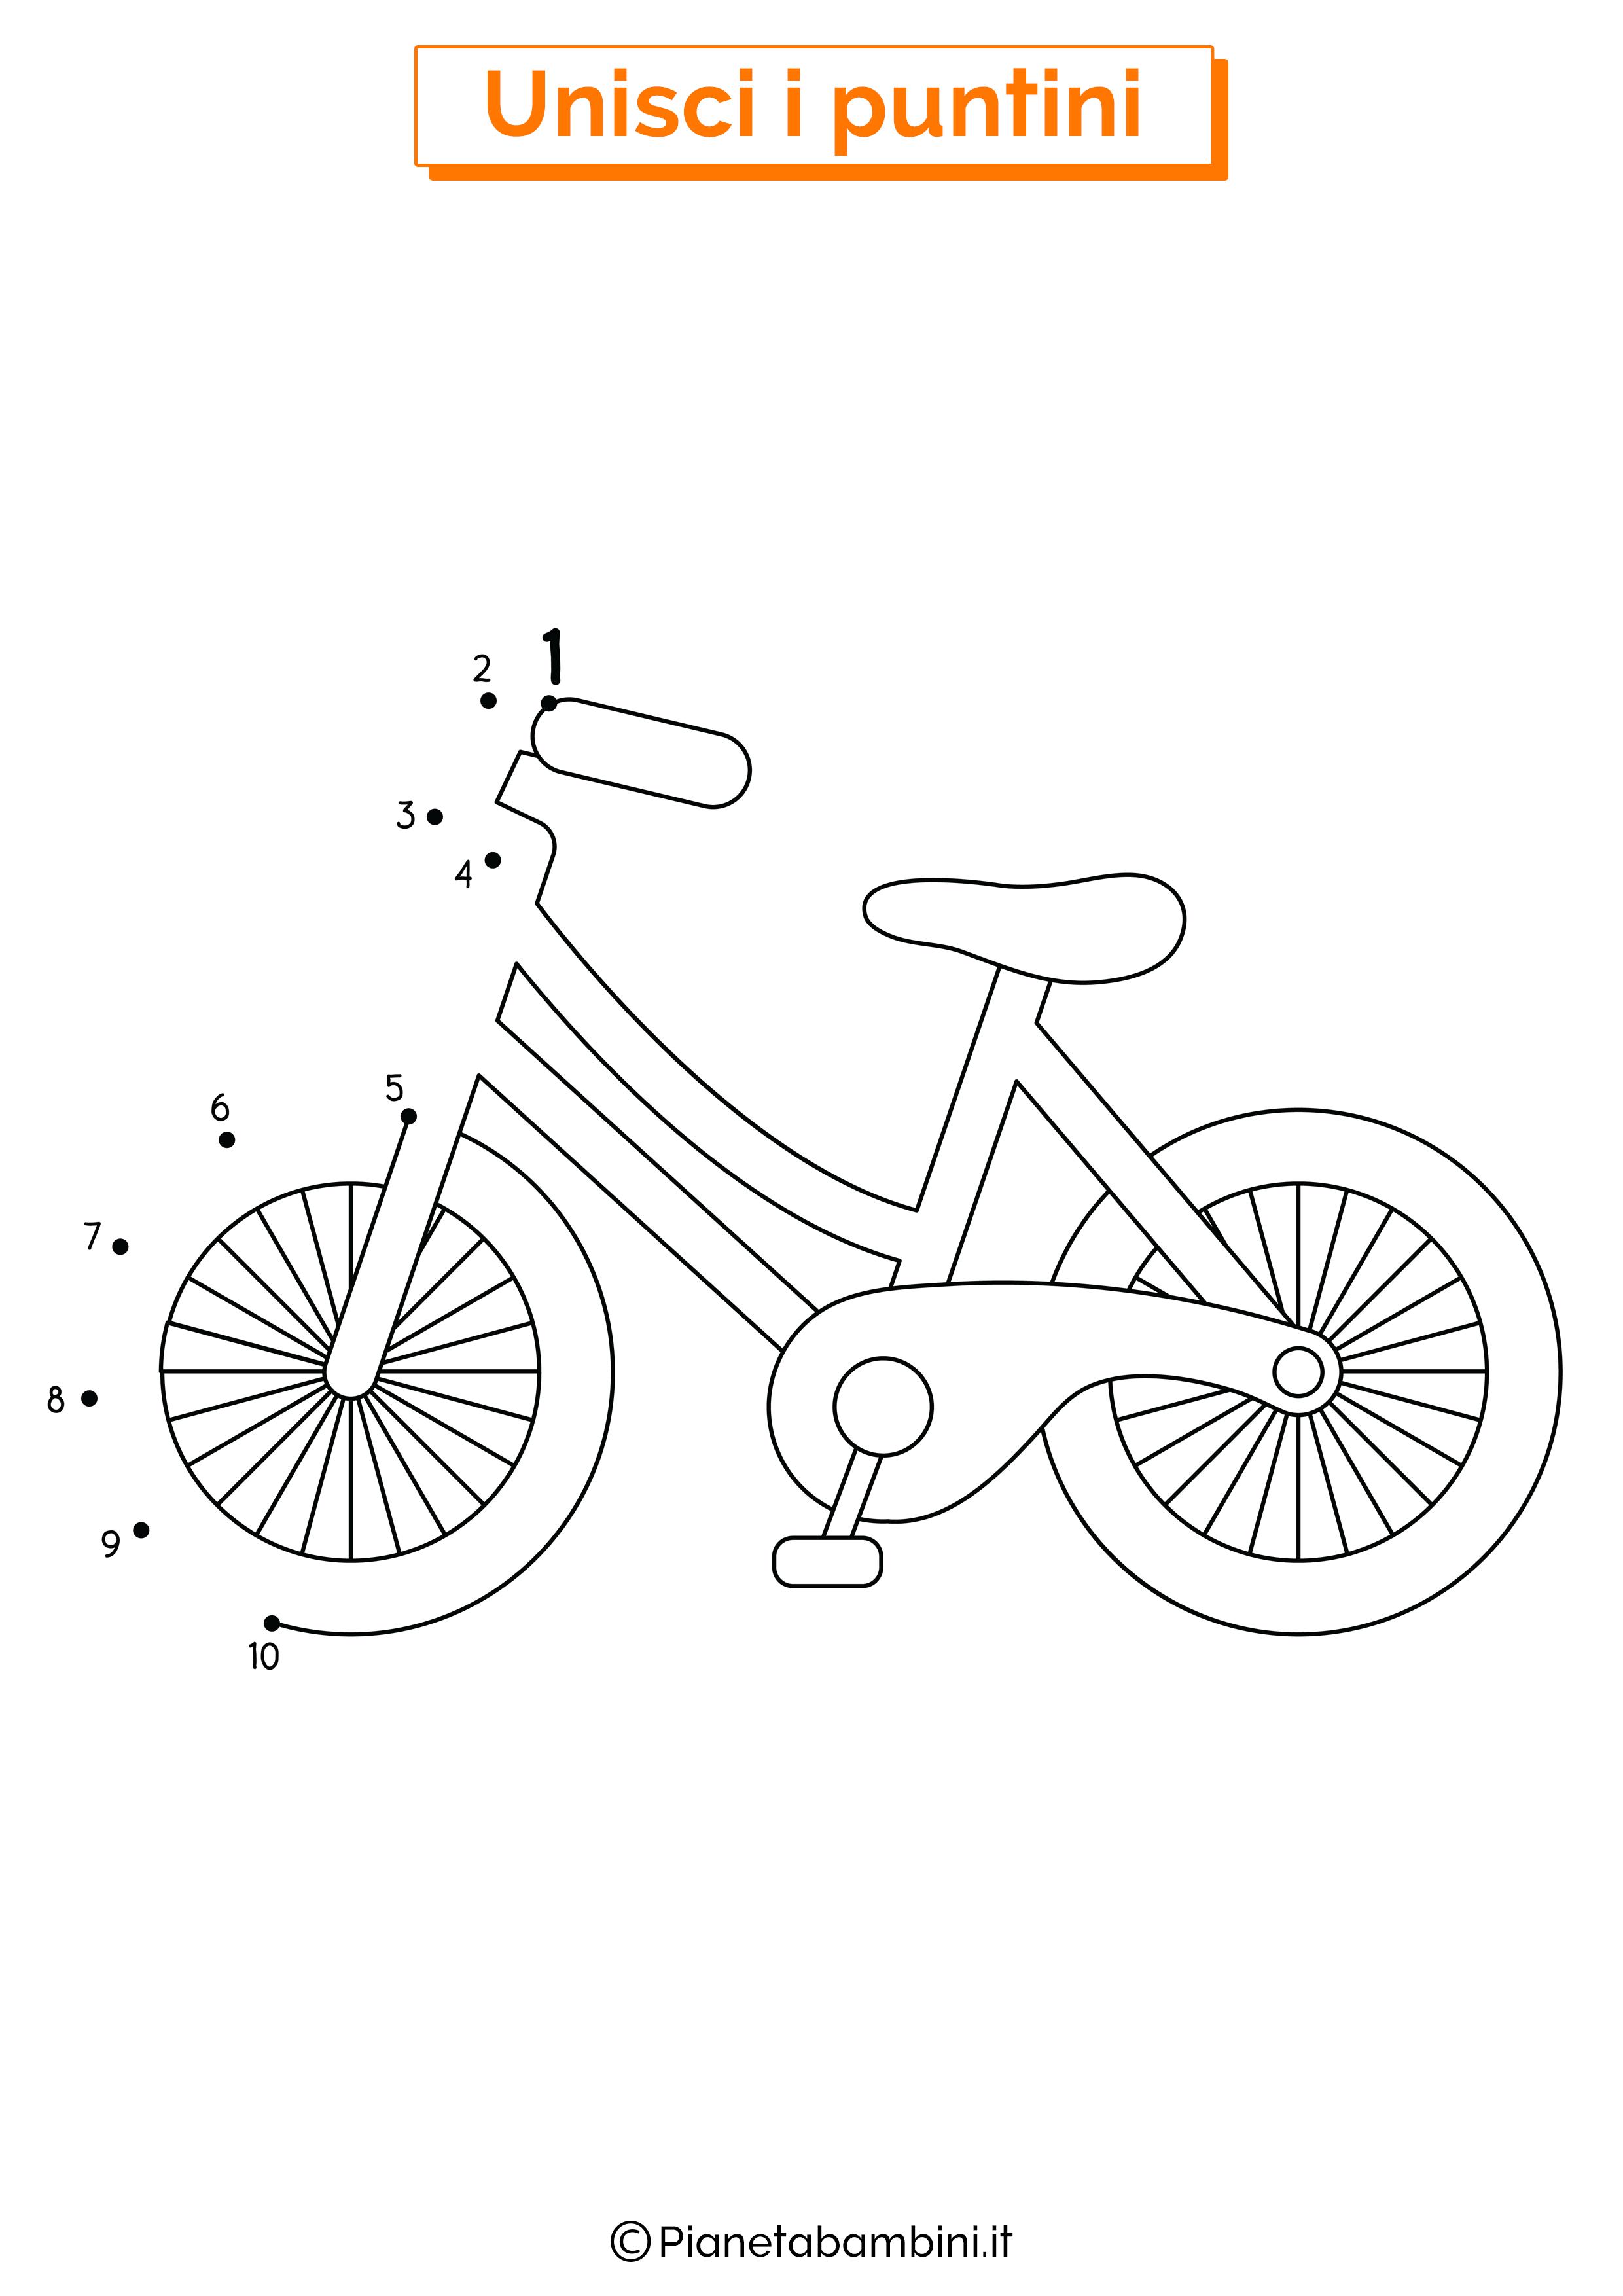 Disegno unisci i puntini da 1 a 10 bicicletta